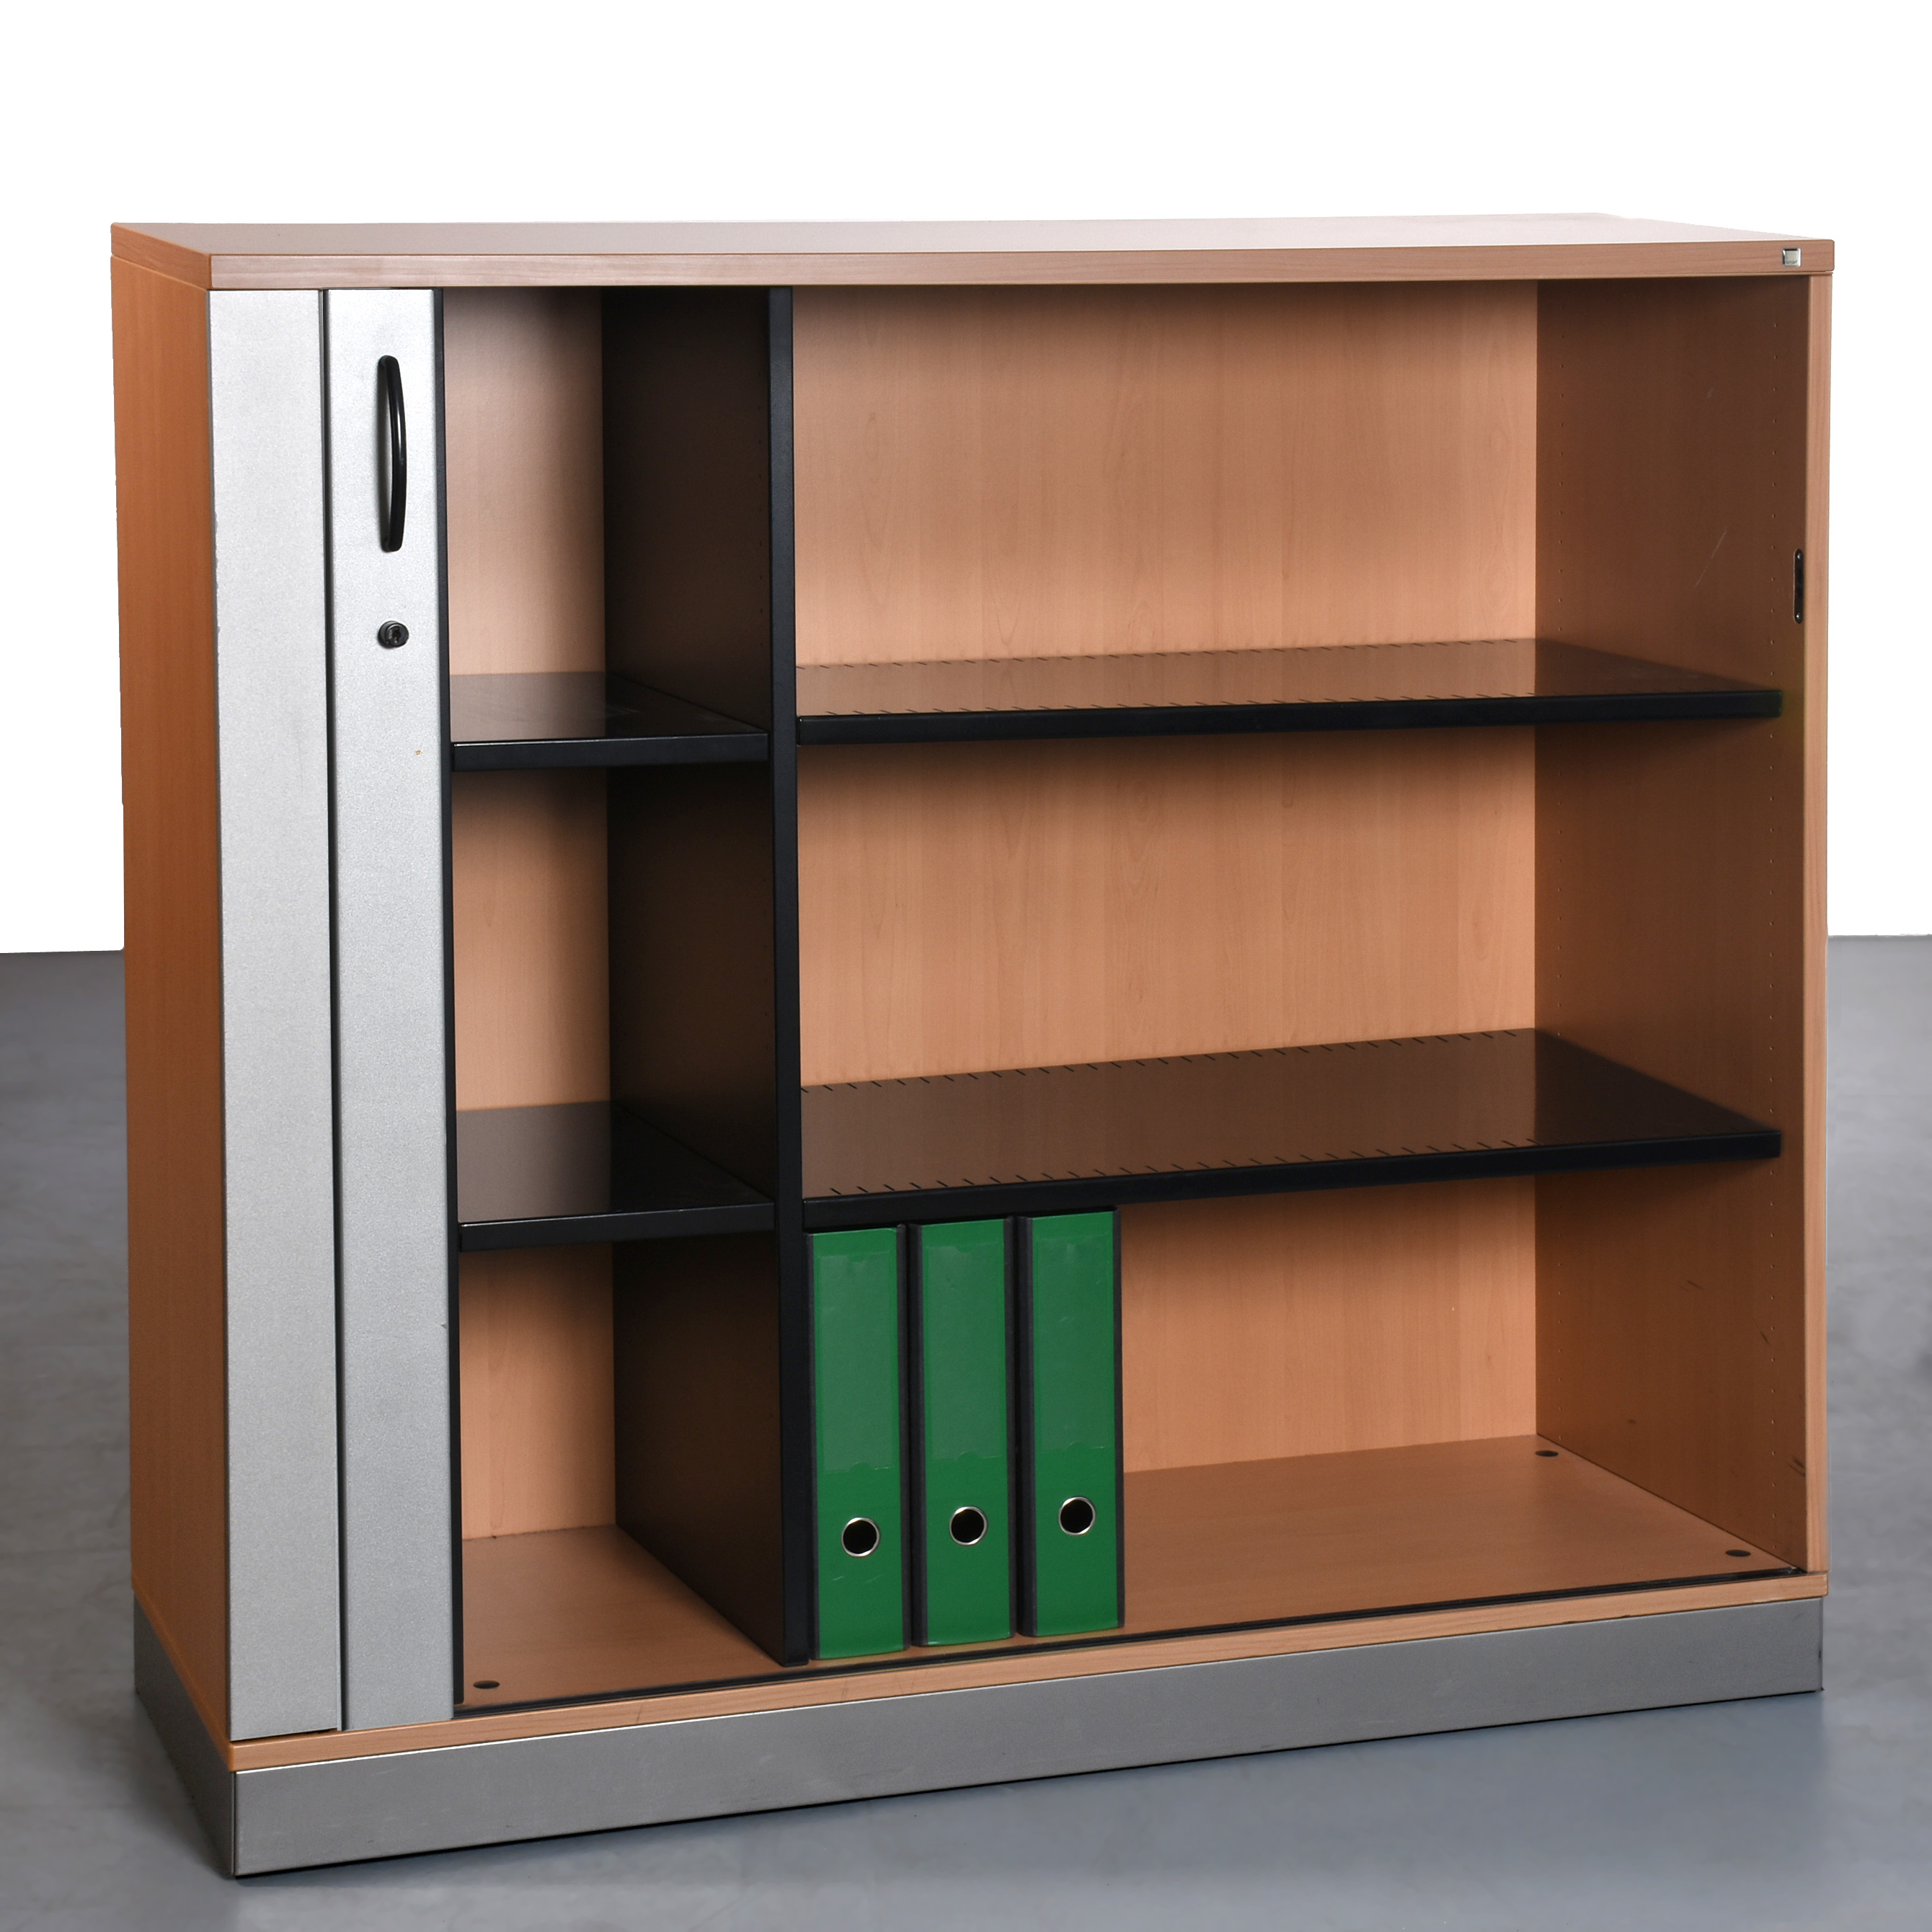 sch rf b rom bel 3oh korpus buche querrollade silber gebraucht gesamt h he 115 x breite 120 x. Black Bedroom Furniture Sets. Home Design Ideas